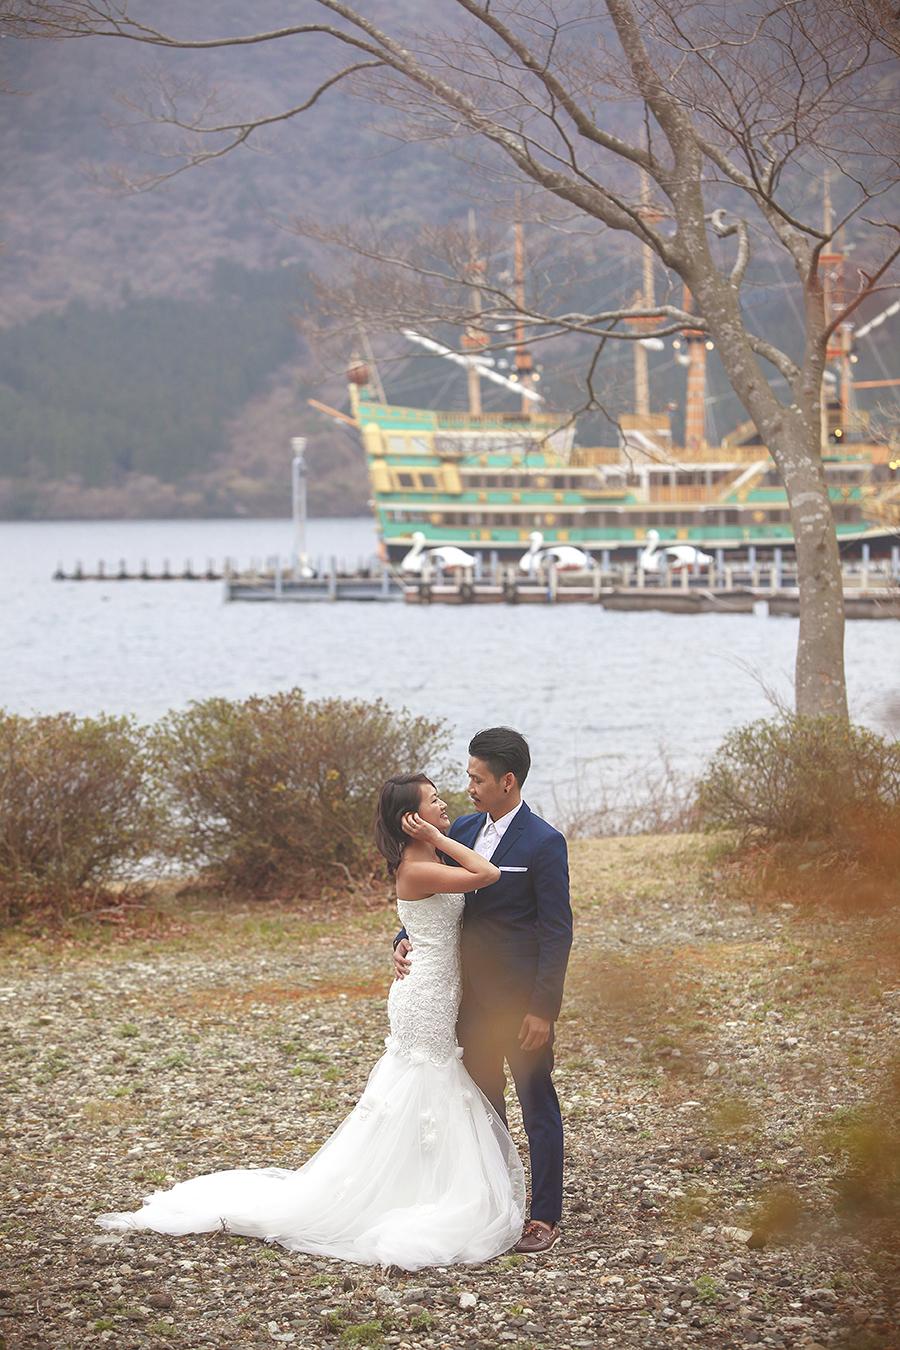 tokyo hakone japan spring sakura . engagement wedding photography by kurt ahs . ns + eu . 0378.jpg